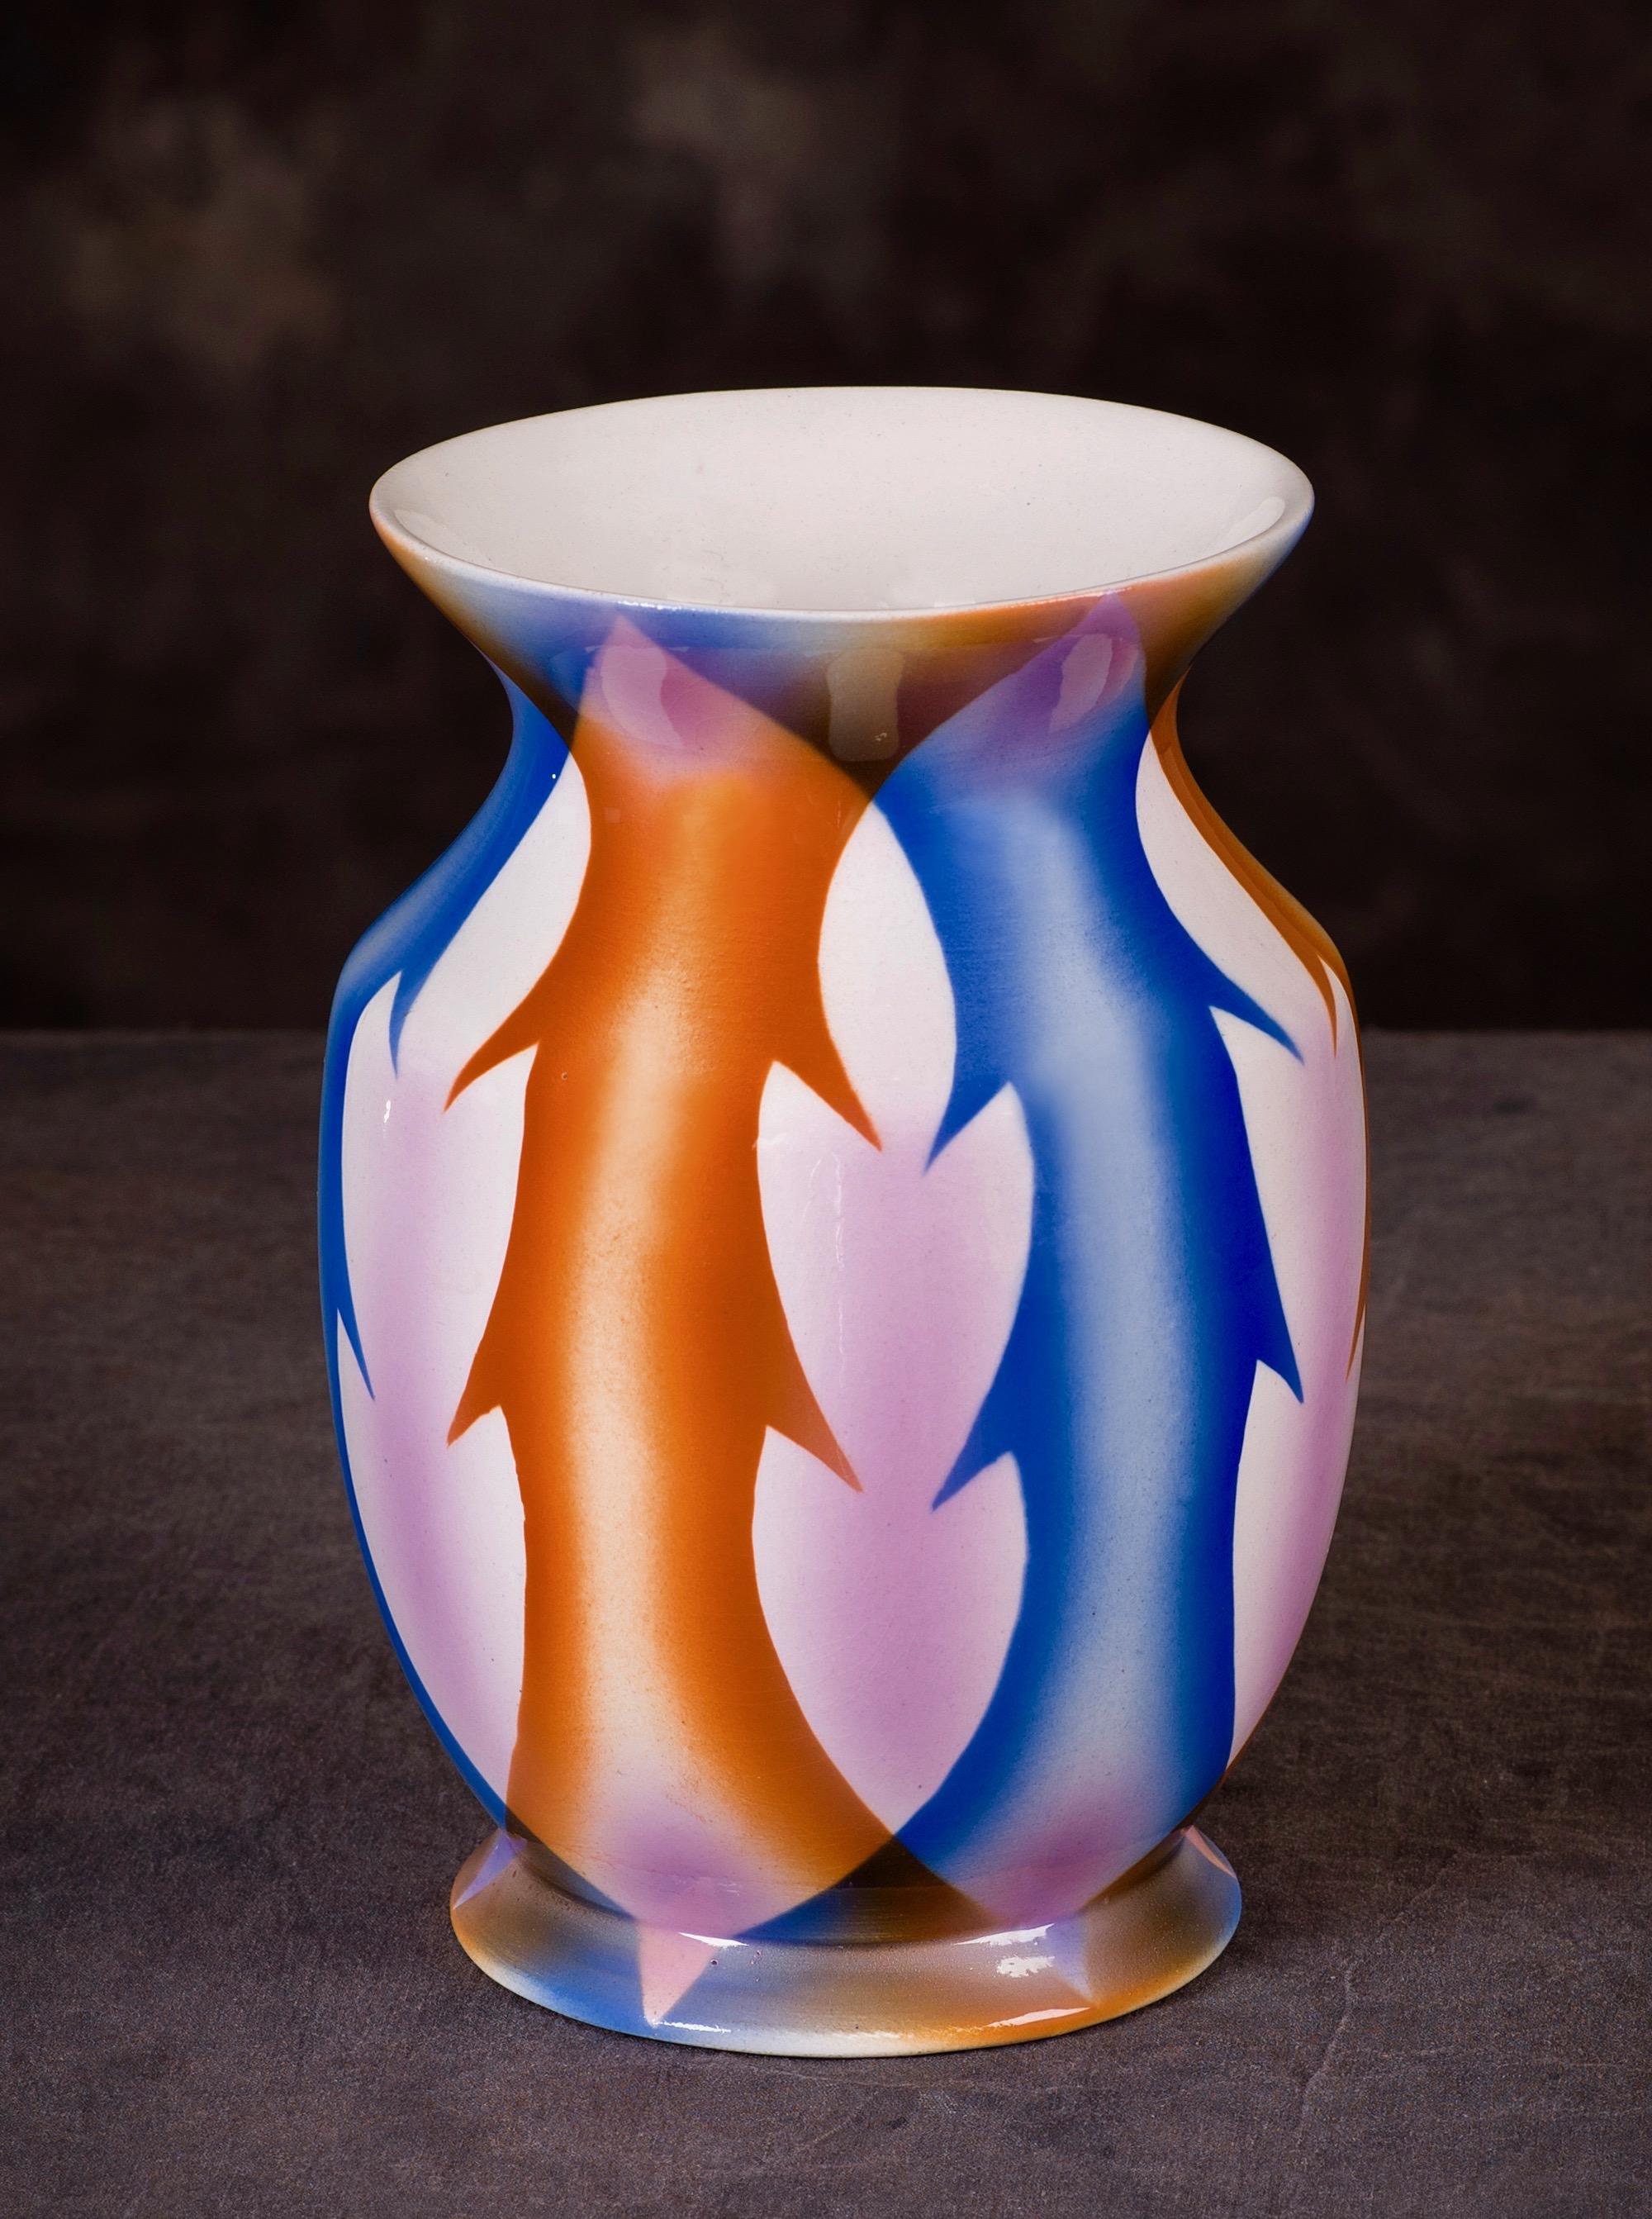 #115 Vase, form 668, dec.1372, Annaburg, ca. 1931. Red mfr.; Blind 668; 19 cm H, 11.6 cm top, 10.3 cm base Ø. RM72